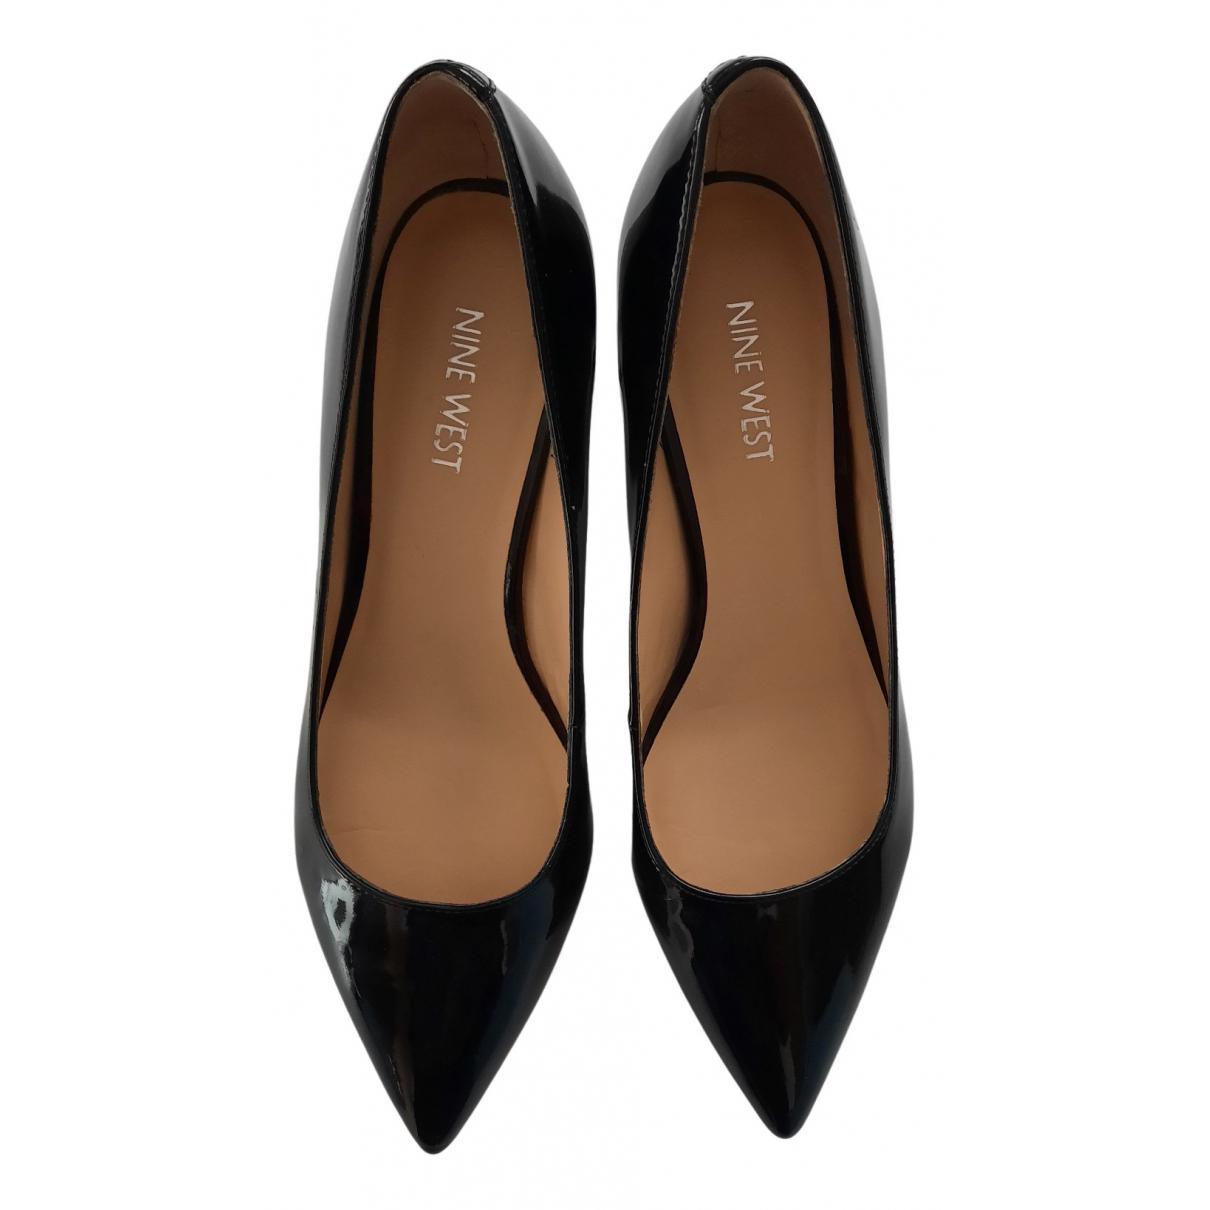 Nine West N Black Leather Heels for Women 38.5 EU